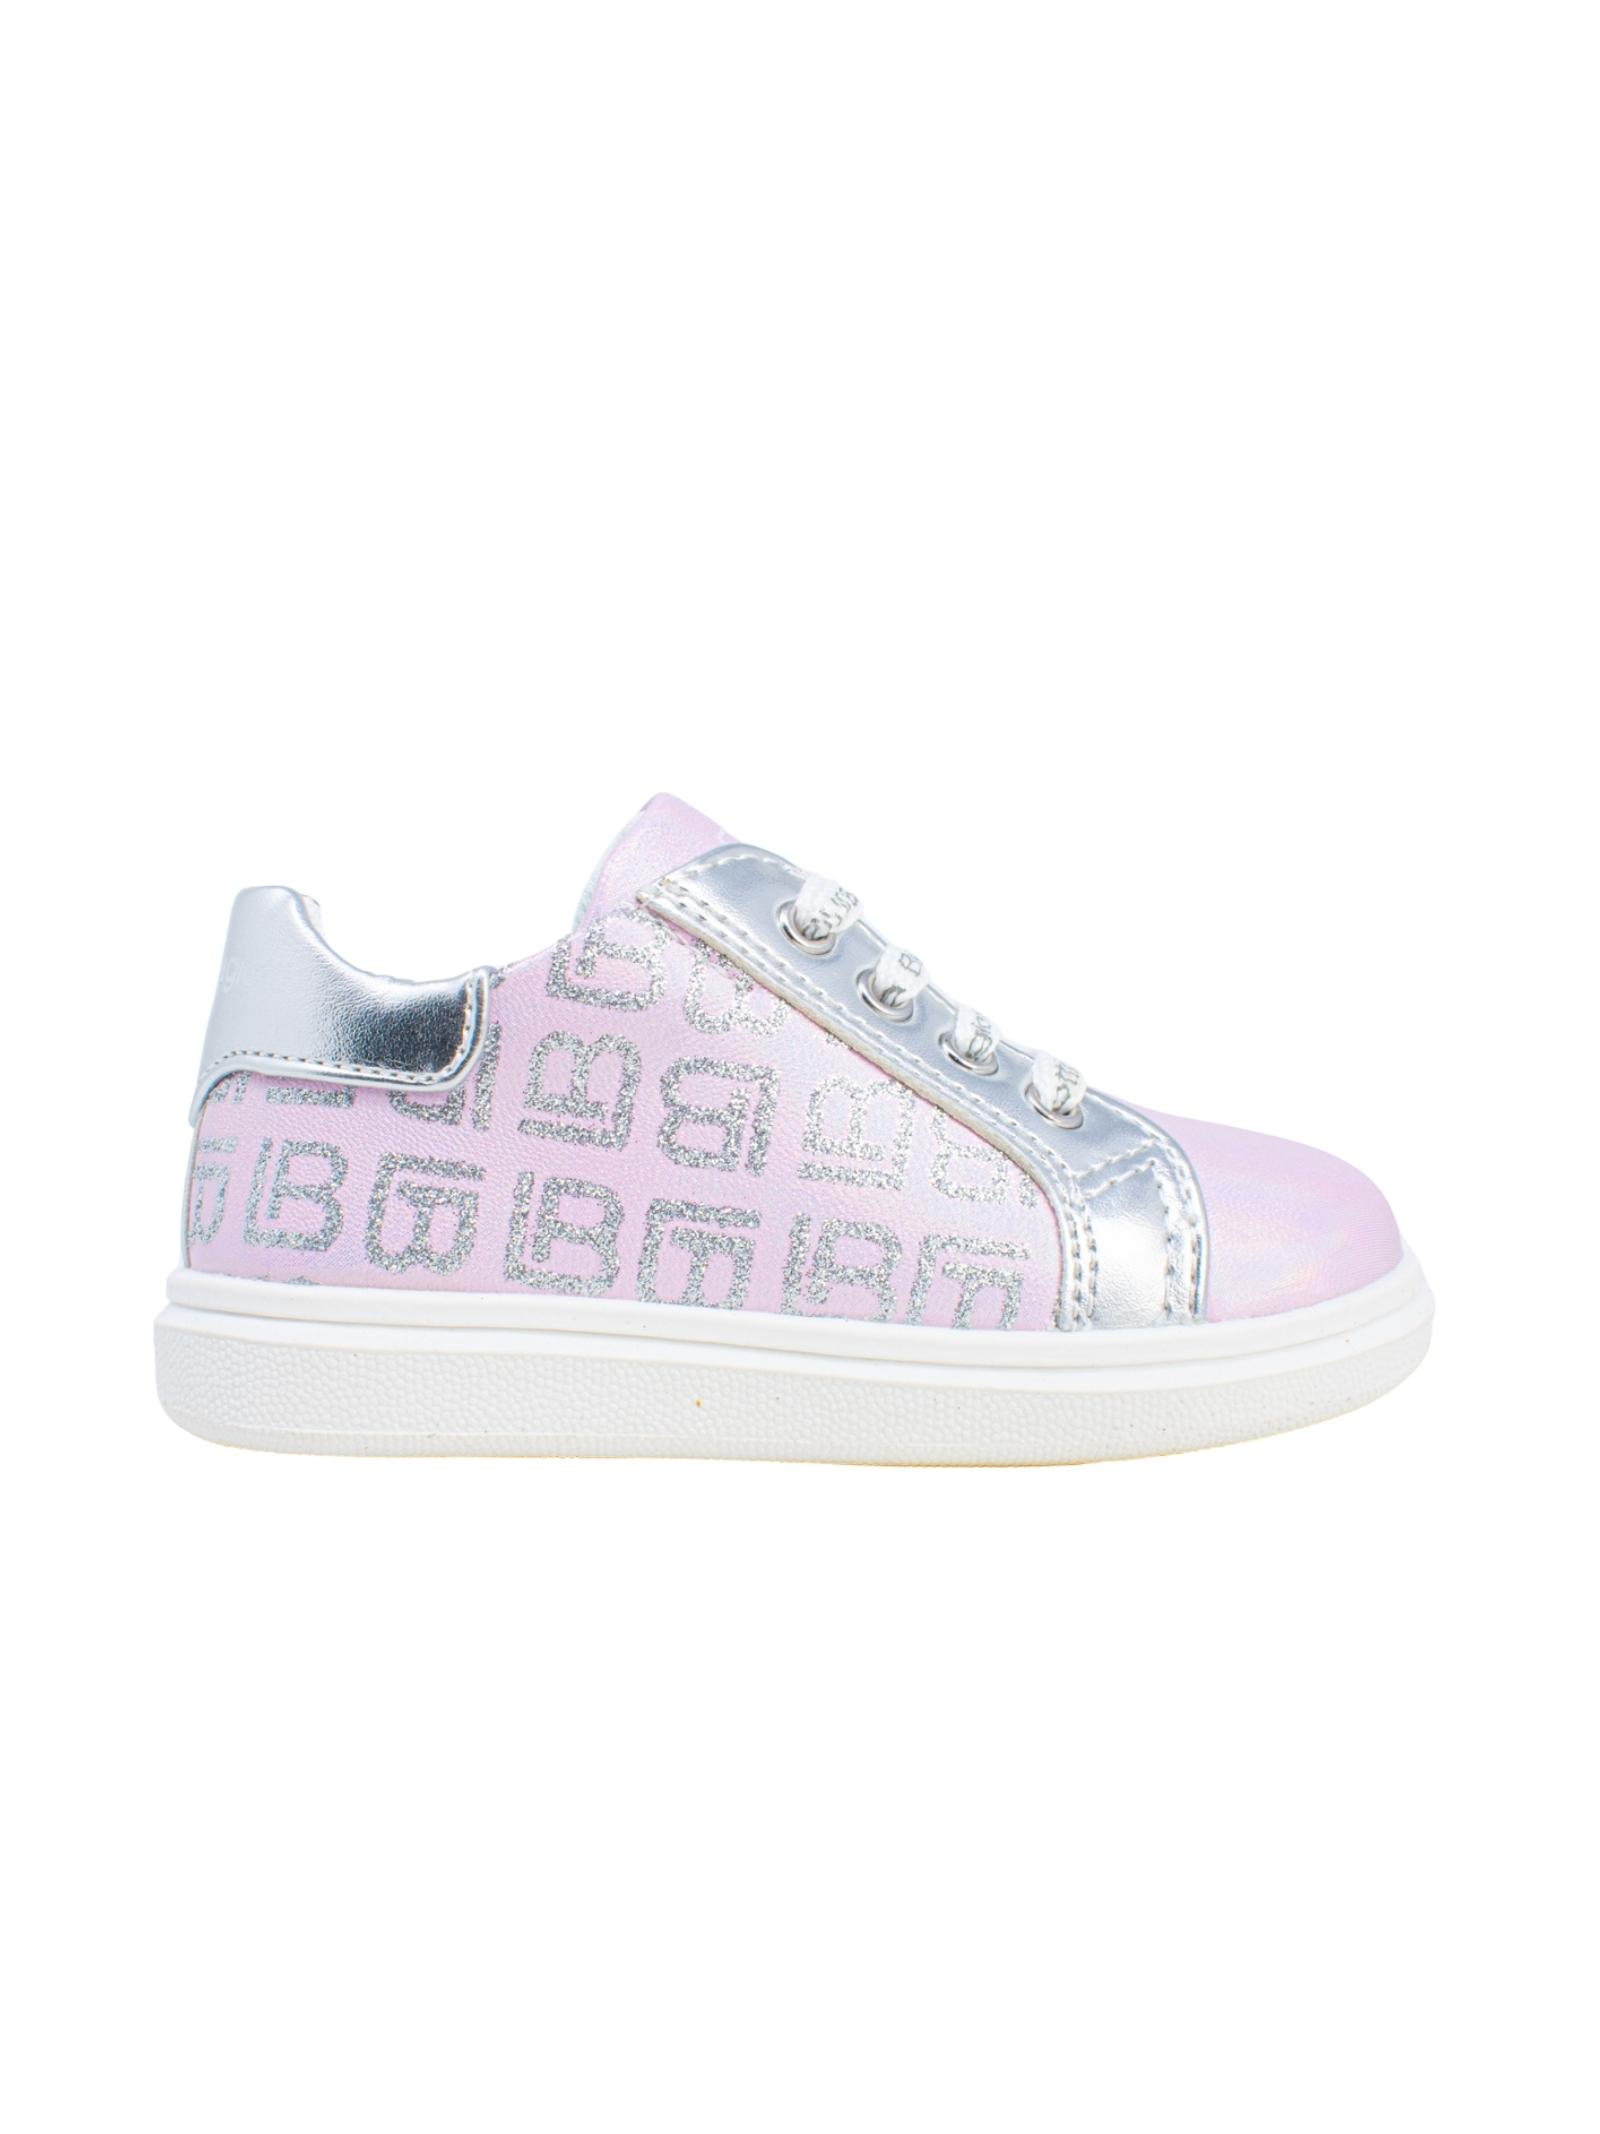 Sneakers Bambina Sirena Logo LAURA BIAGIOTTI KIDS | Sneakers | 7421ROSA